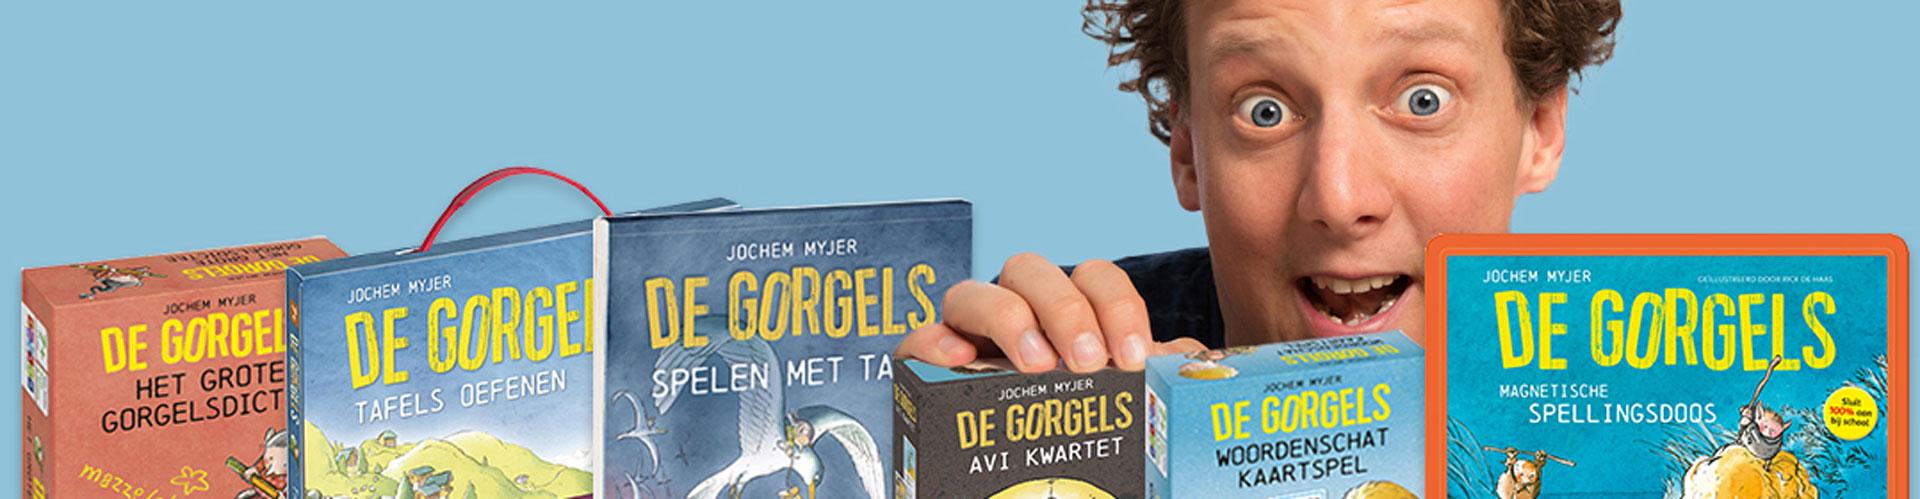 Gorgels-banner-edutainment-boeken